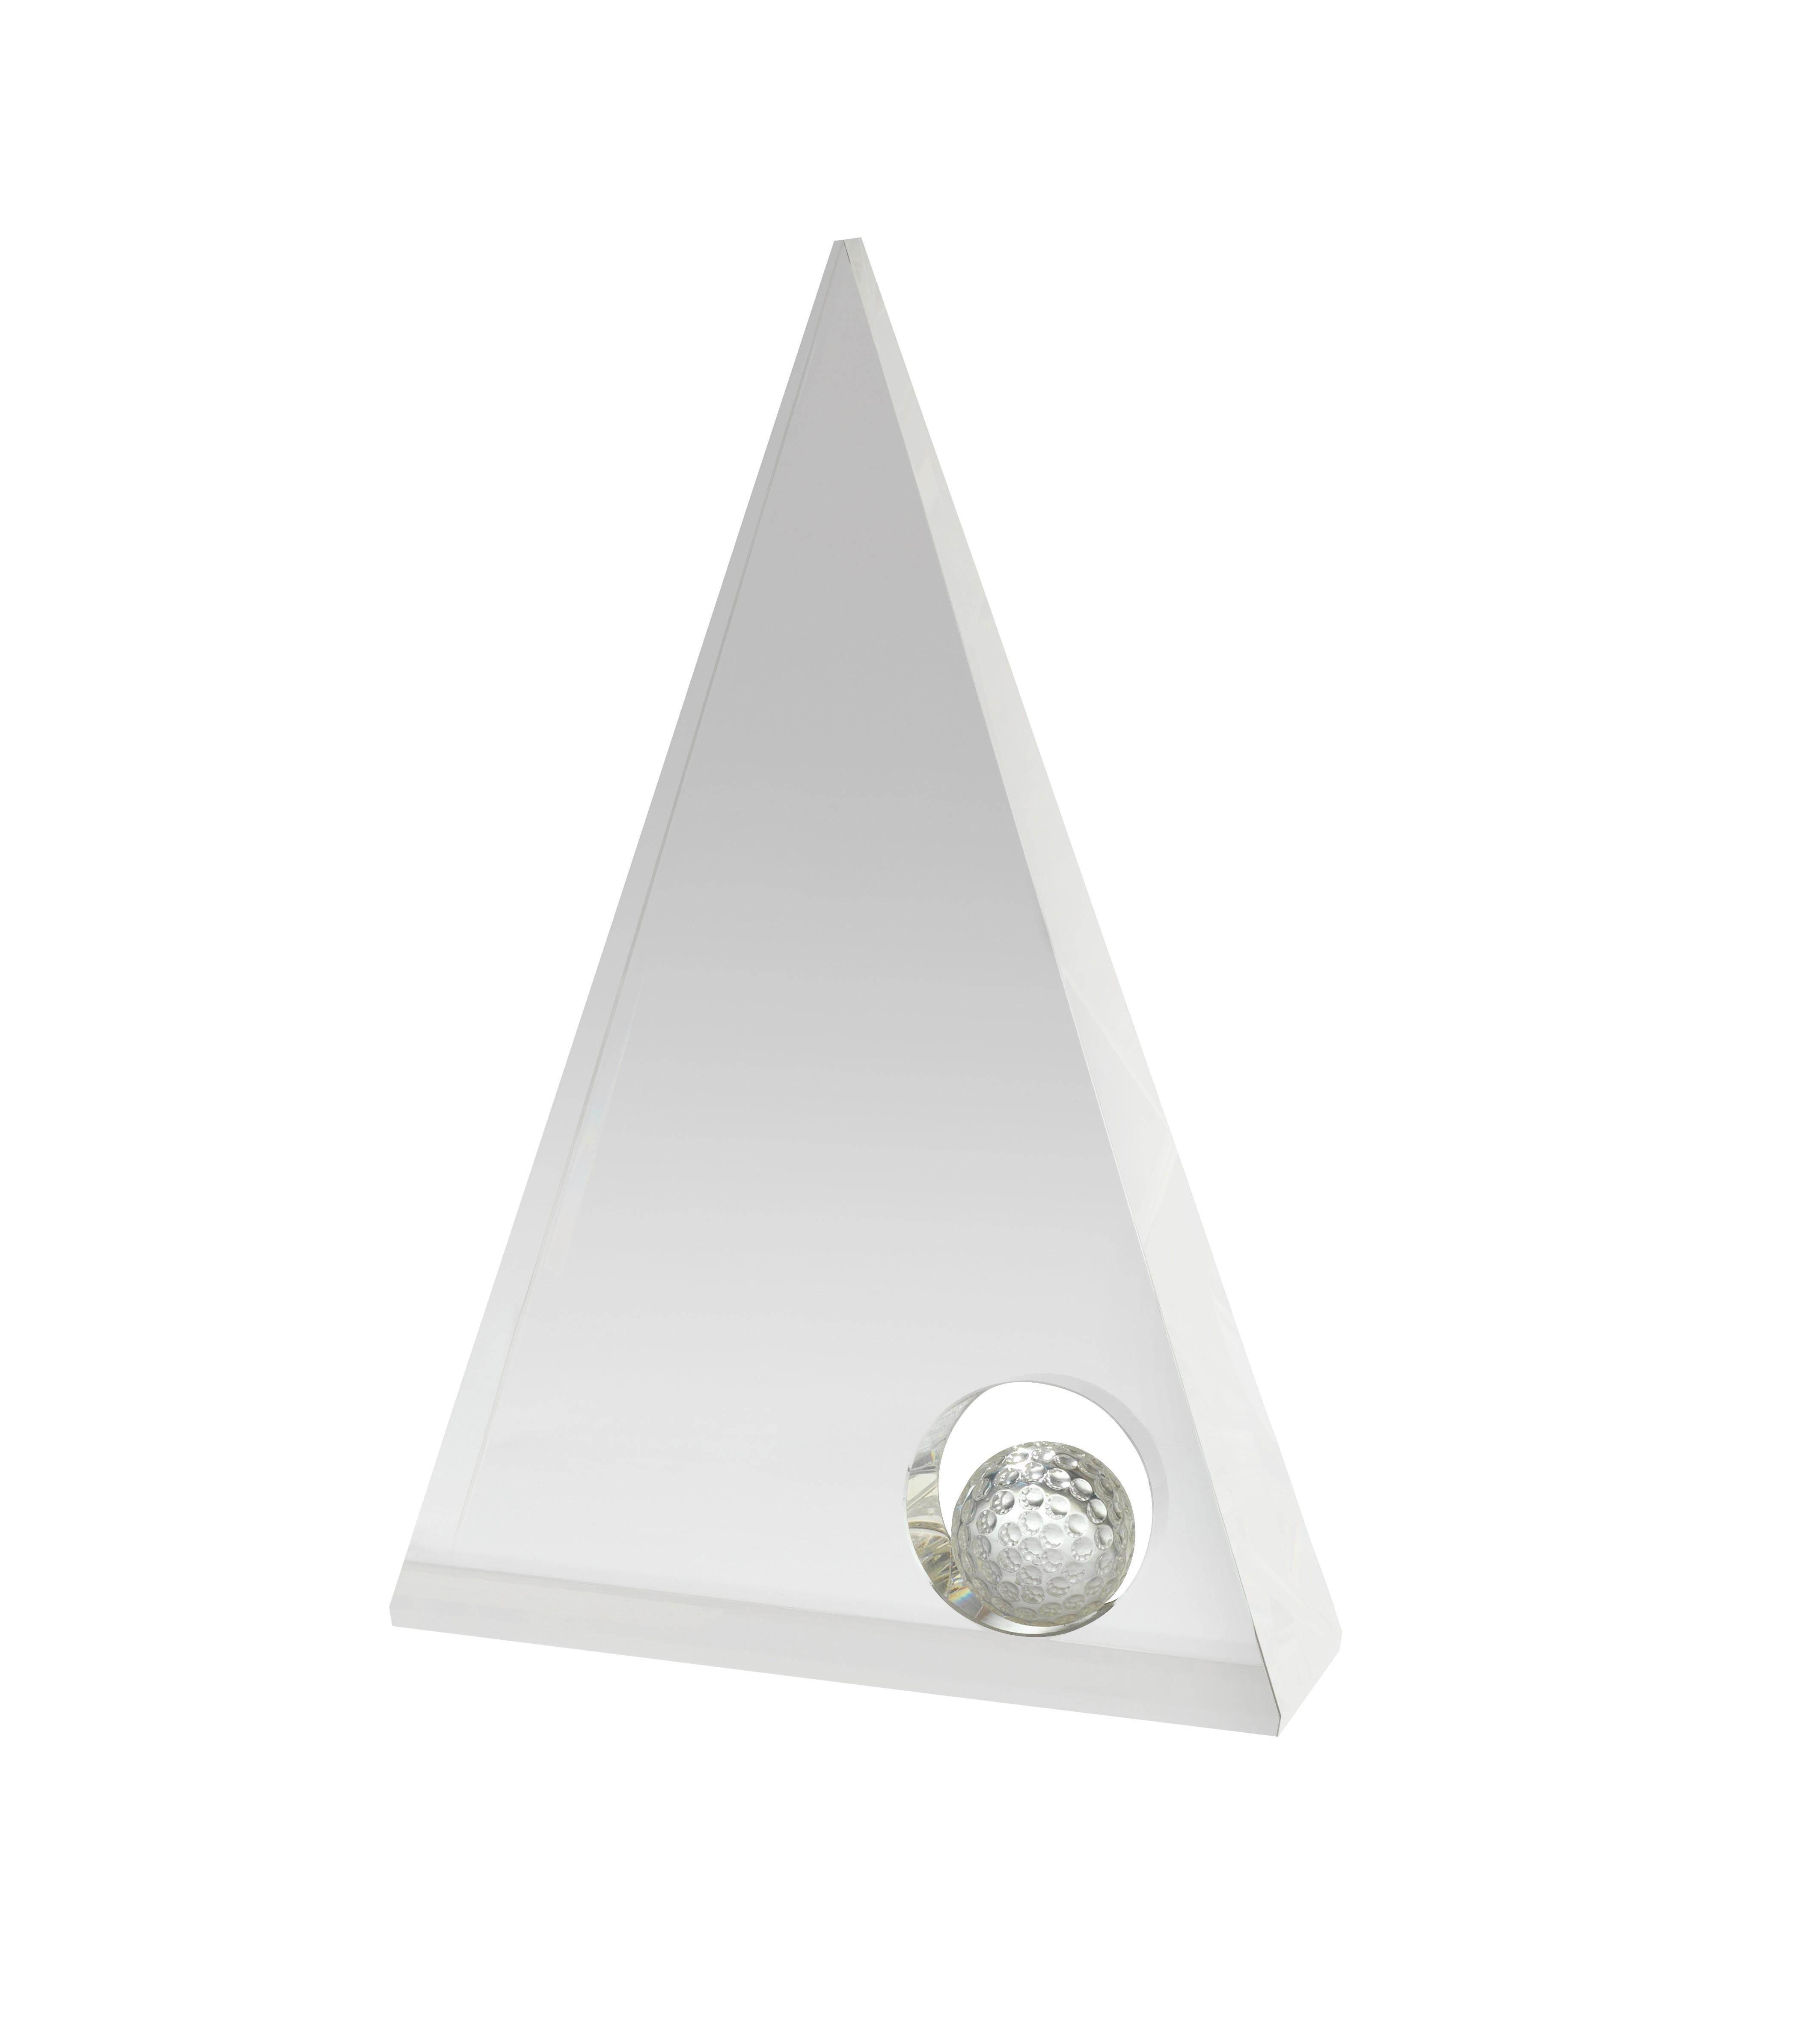 20cm Golf Crystal Award